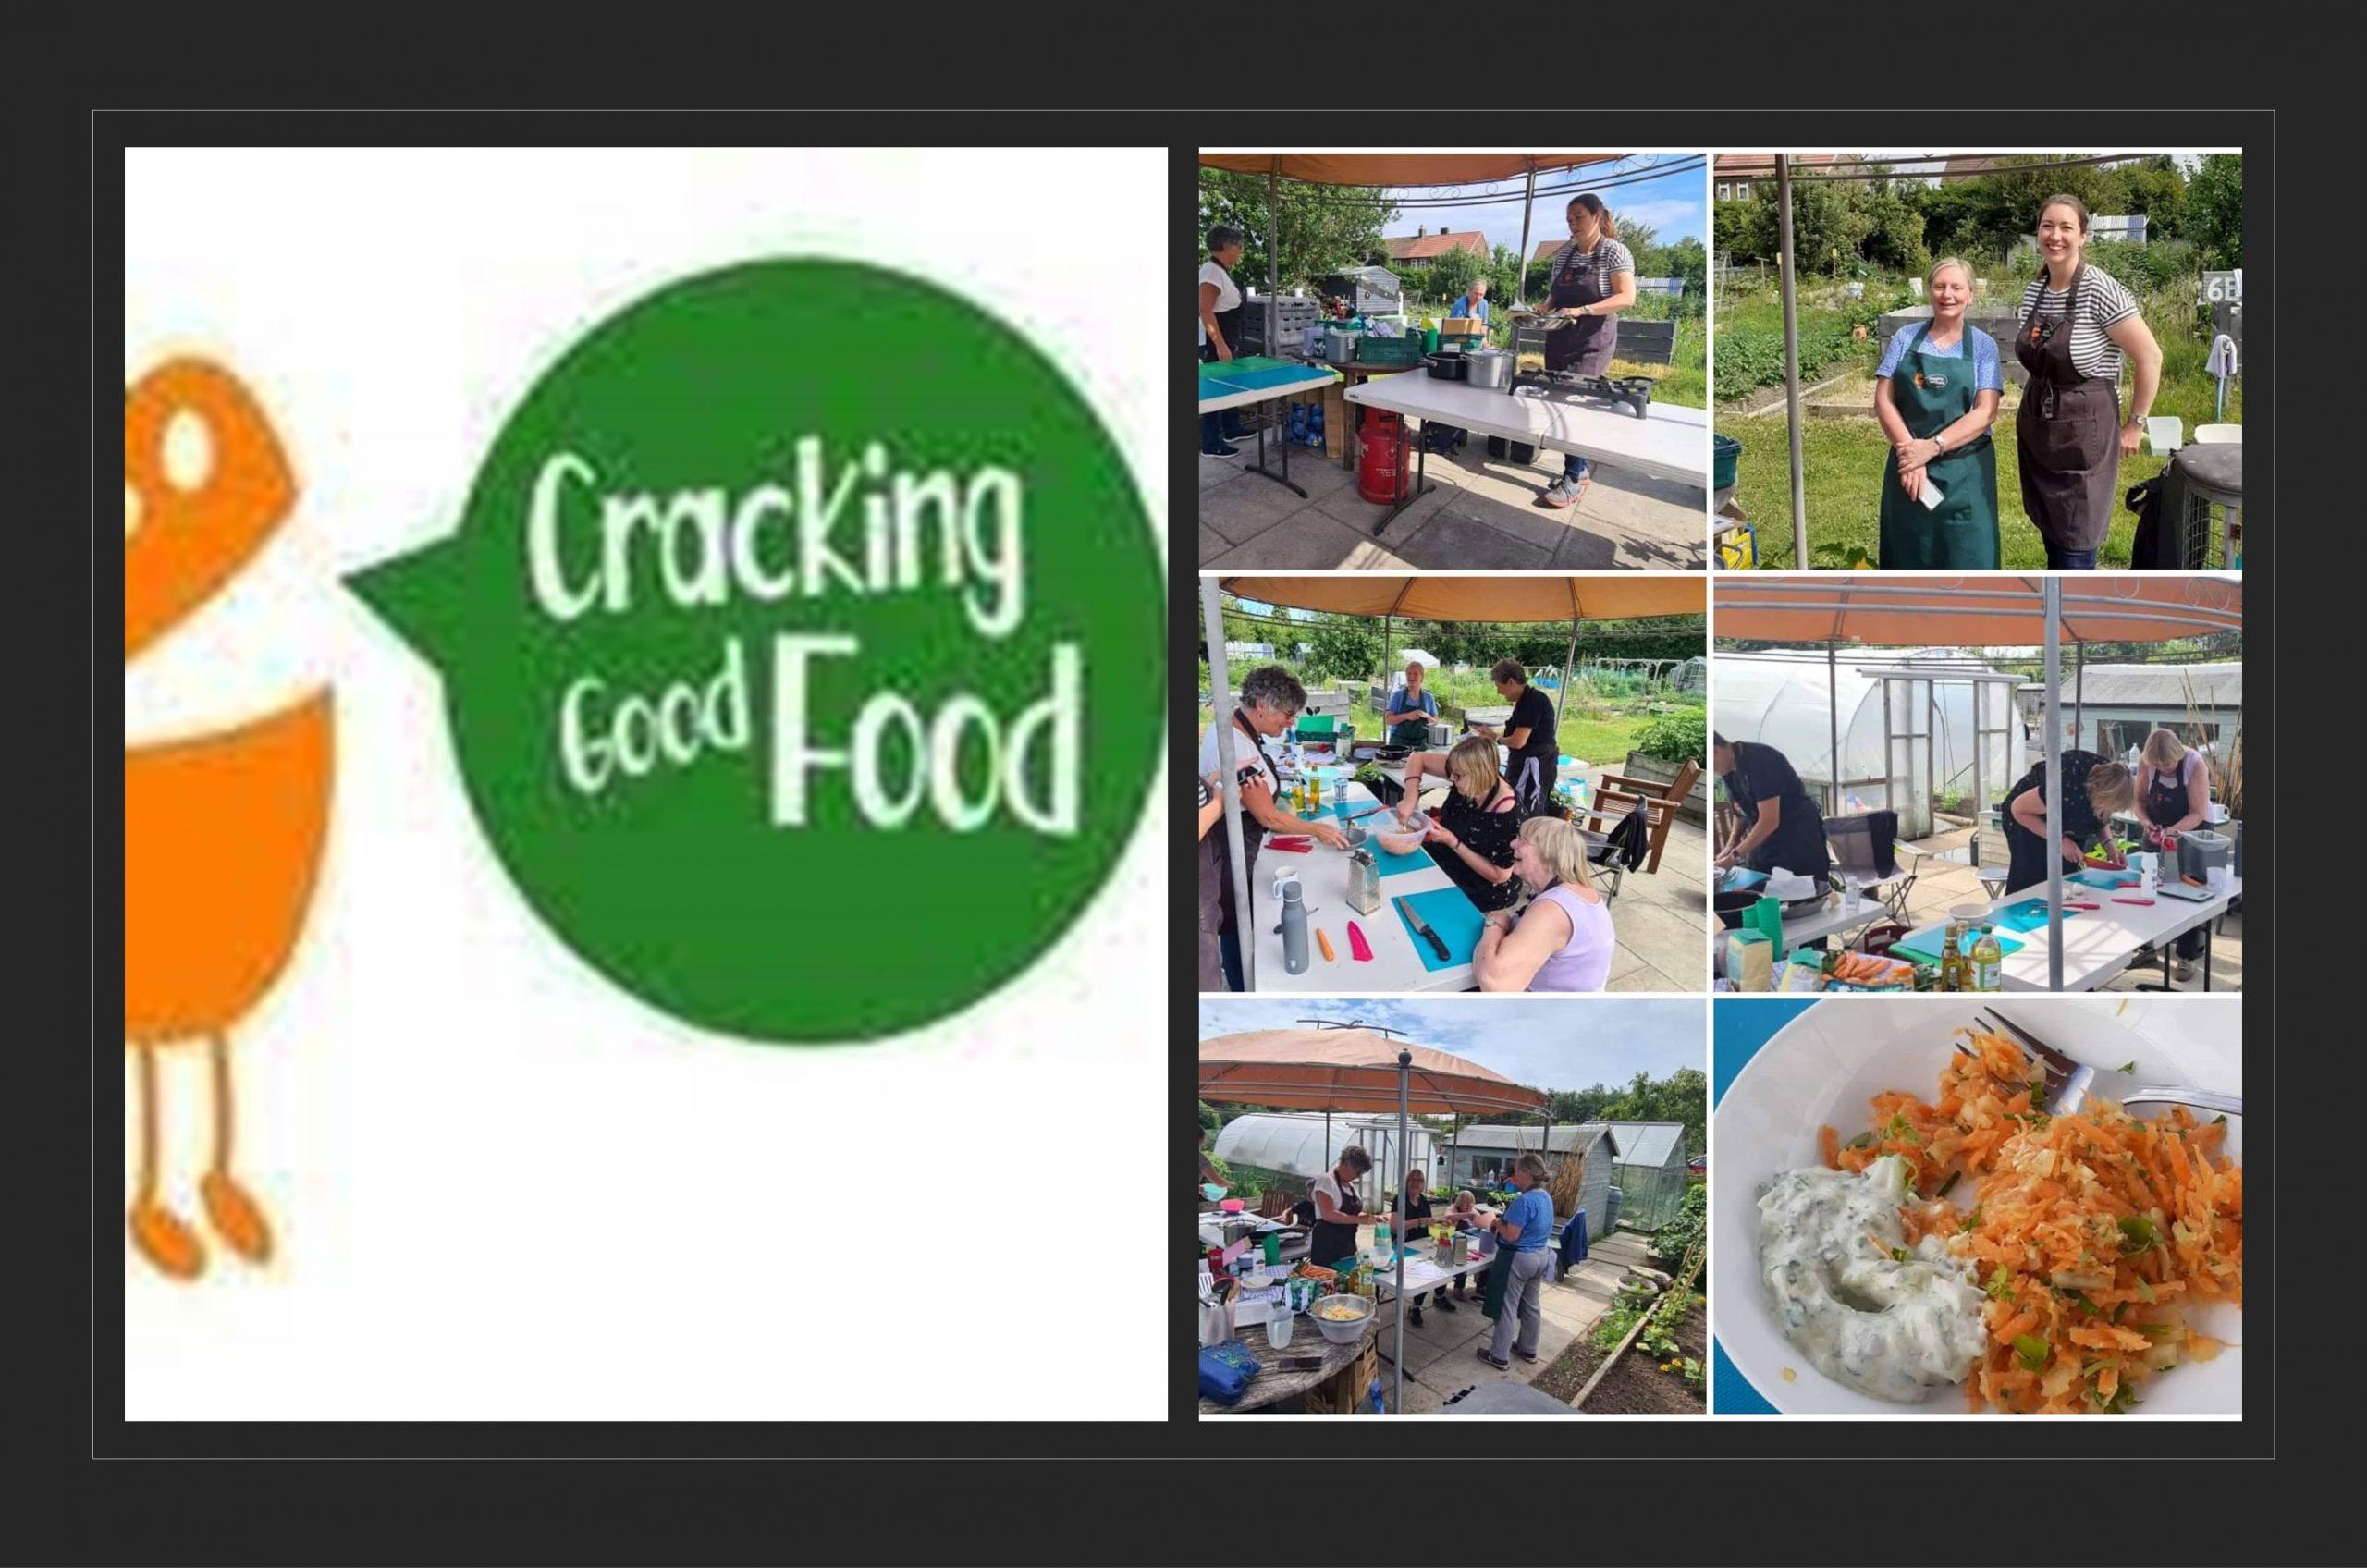 Cracking Good Food!